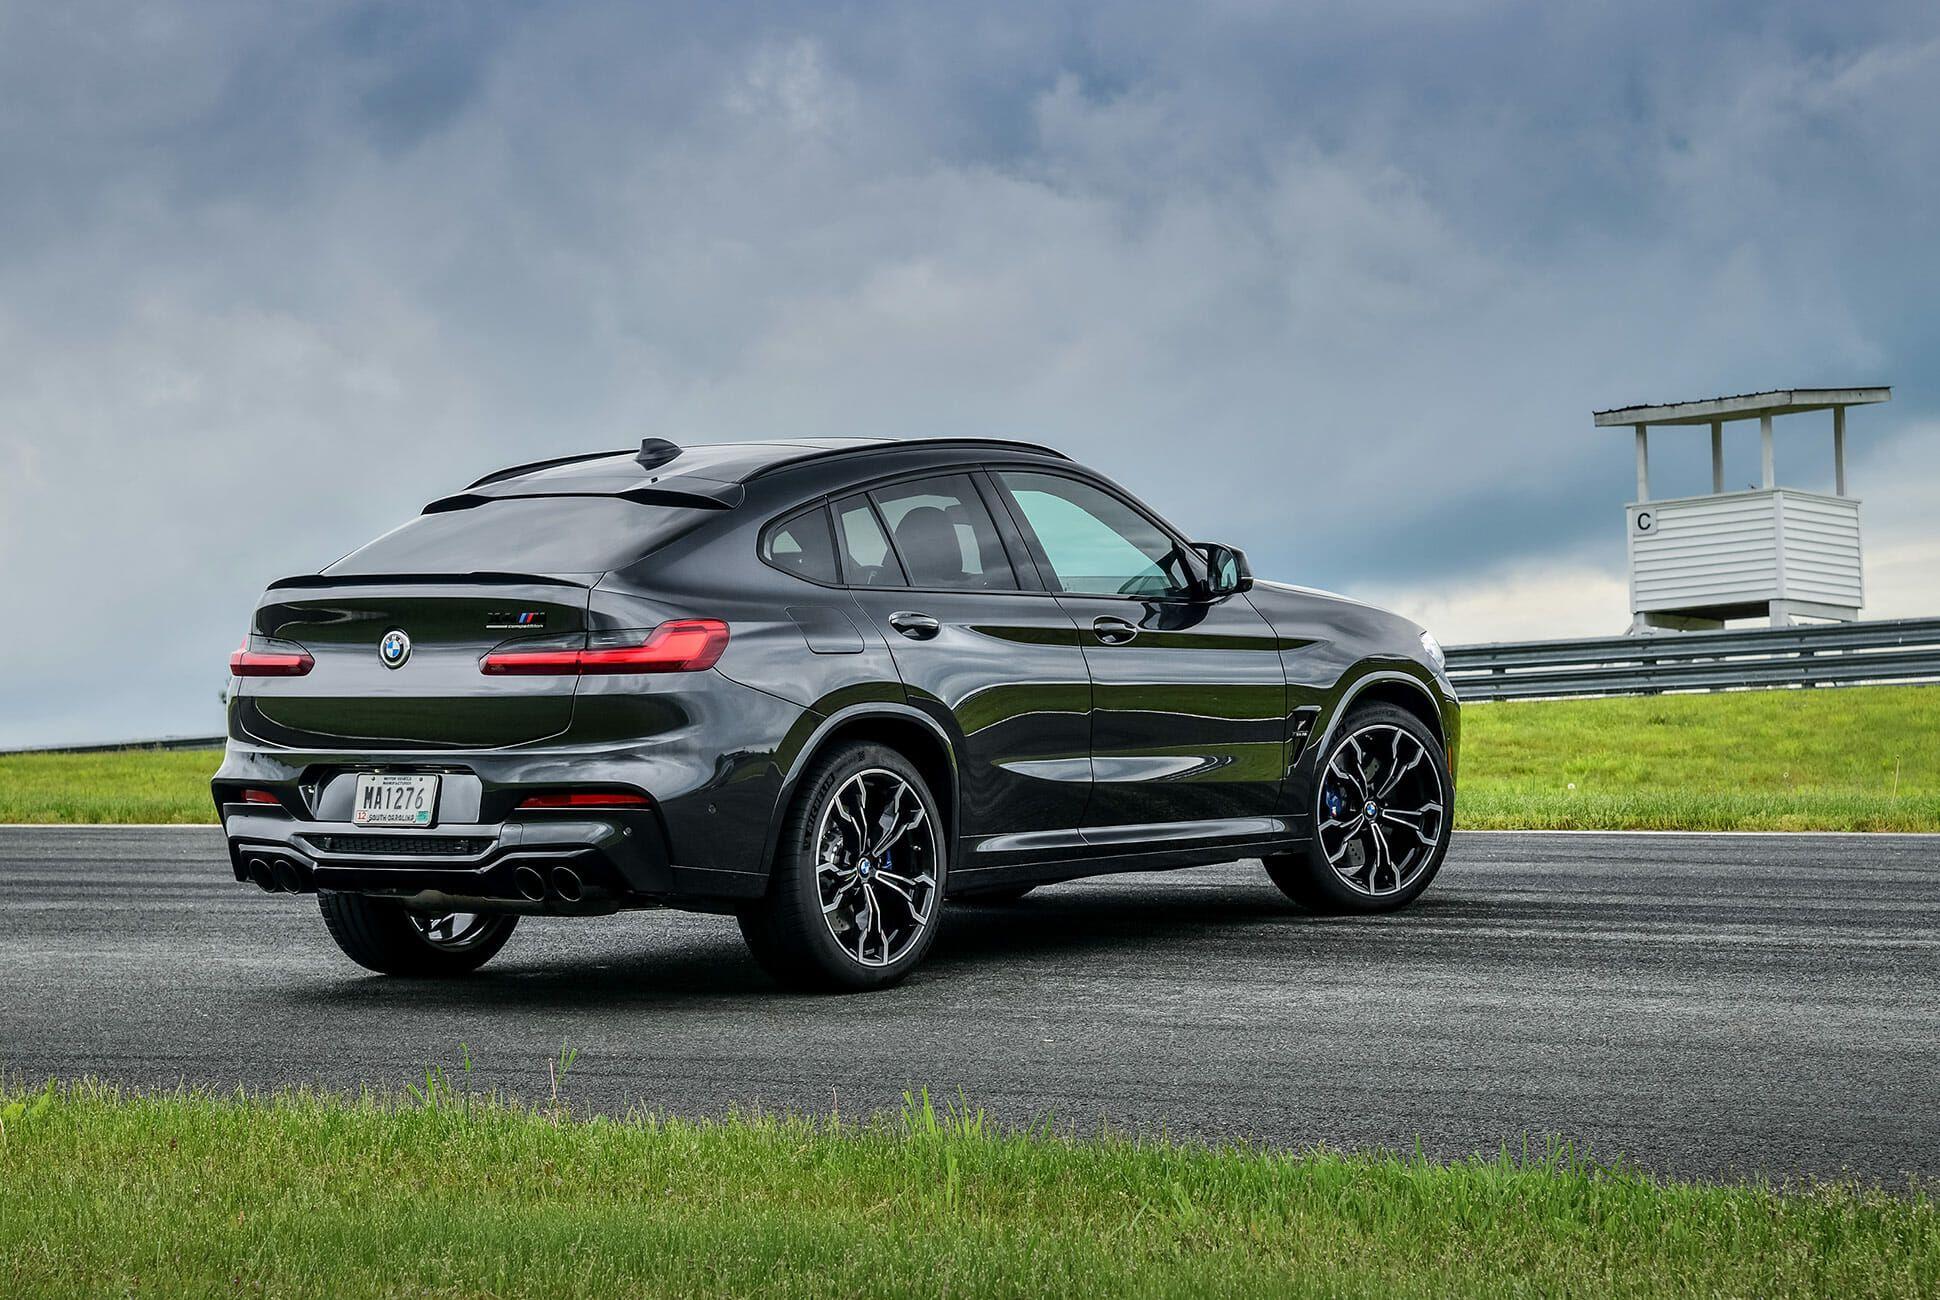 2020-BMW-X3-M-X4-M-Review-gear-patrol-slide-9